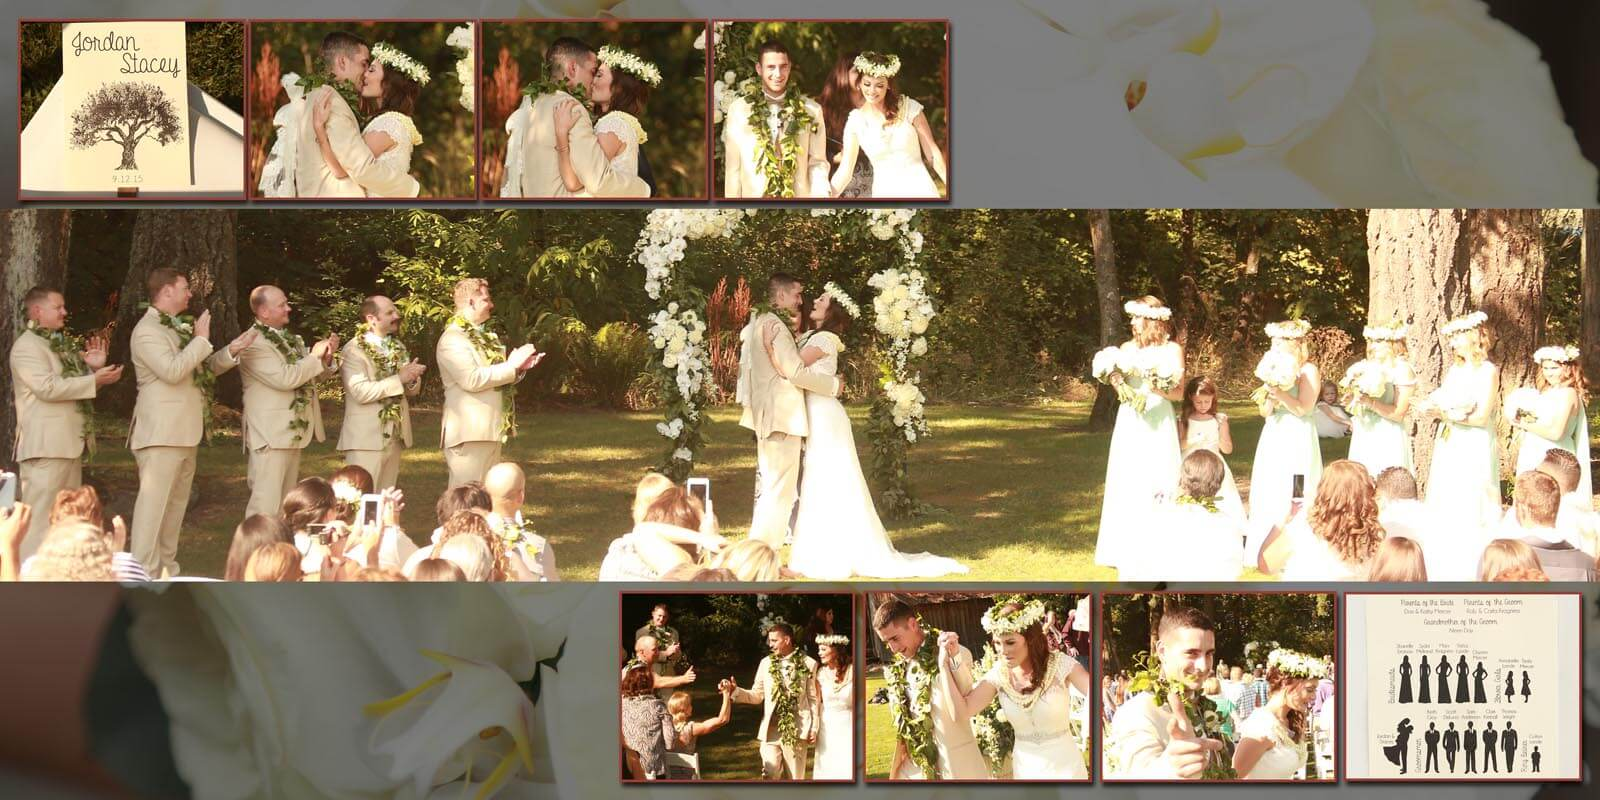 Jasper-House-Farm-Outdoor-Wedding-Lane-County-Oregon-photographers-046-047.jpg